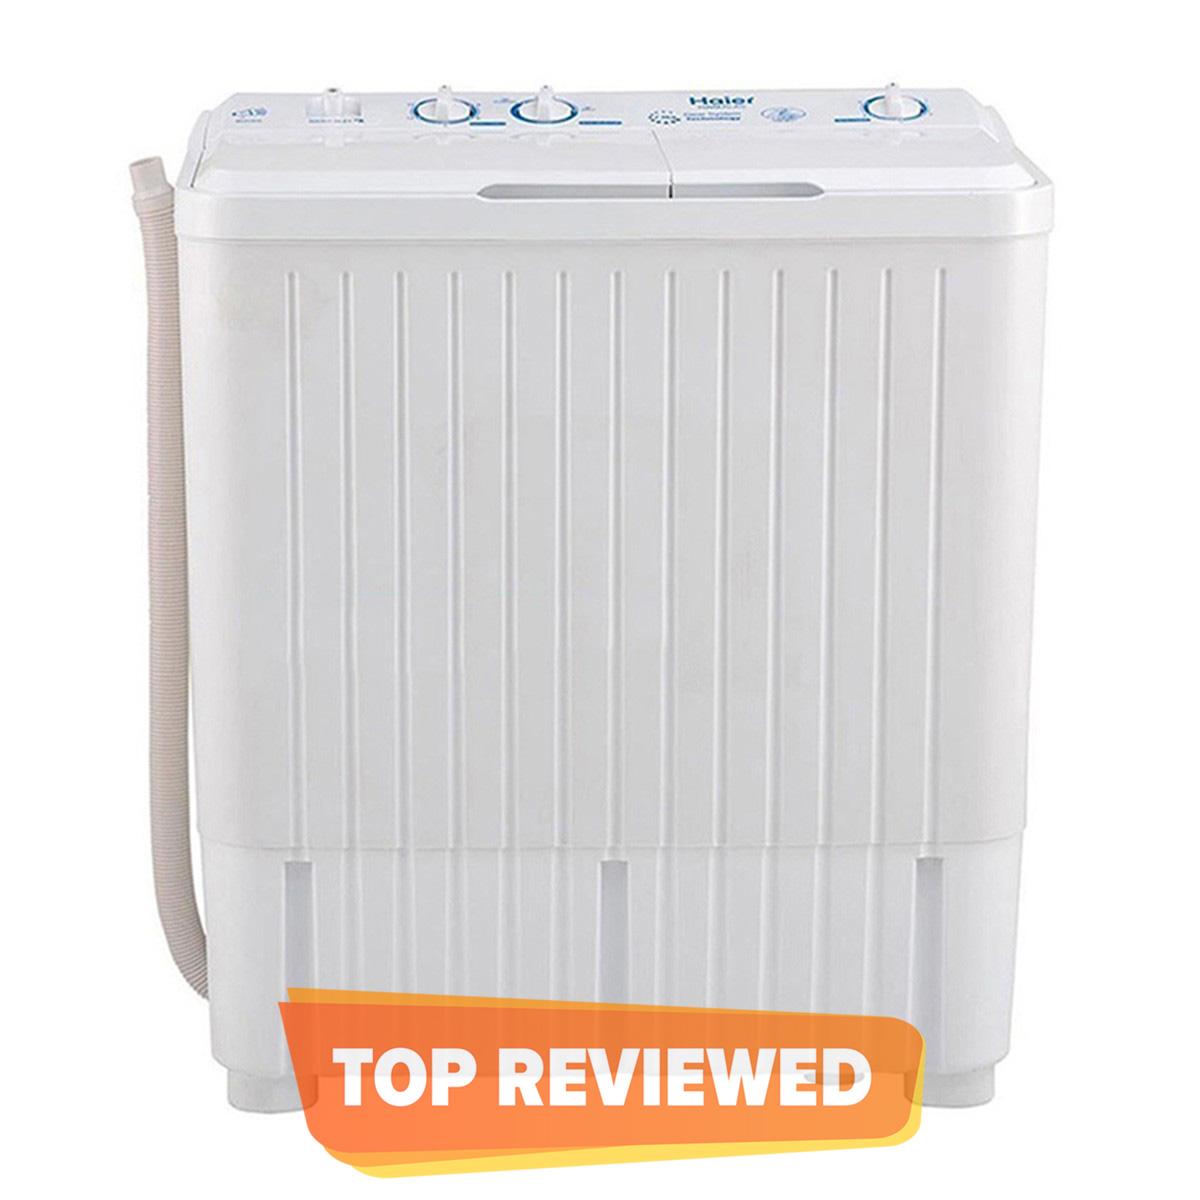 Haier 7.5 kg - Twin Tub Top Load Semi Automatic Washing Machine HWM 75-AS - White